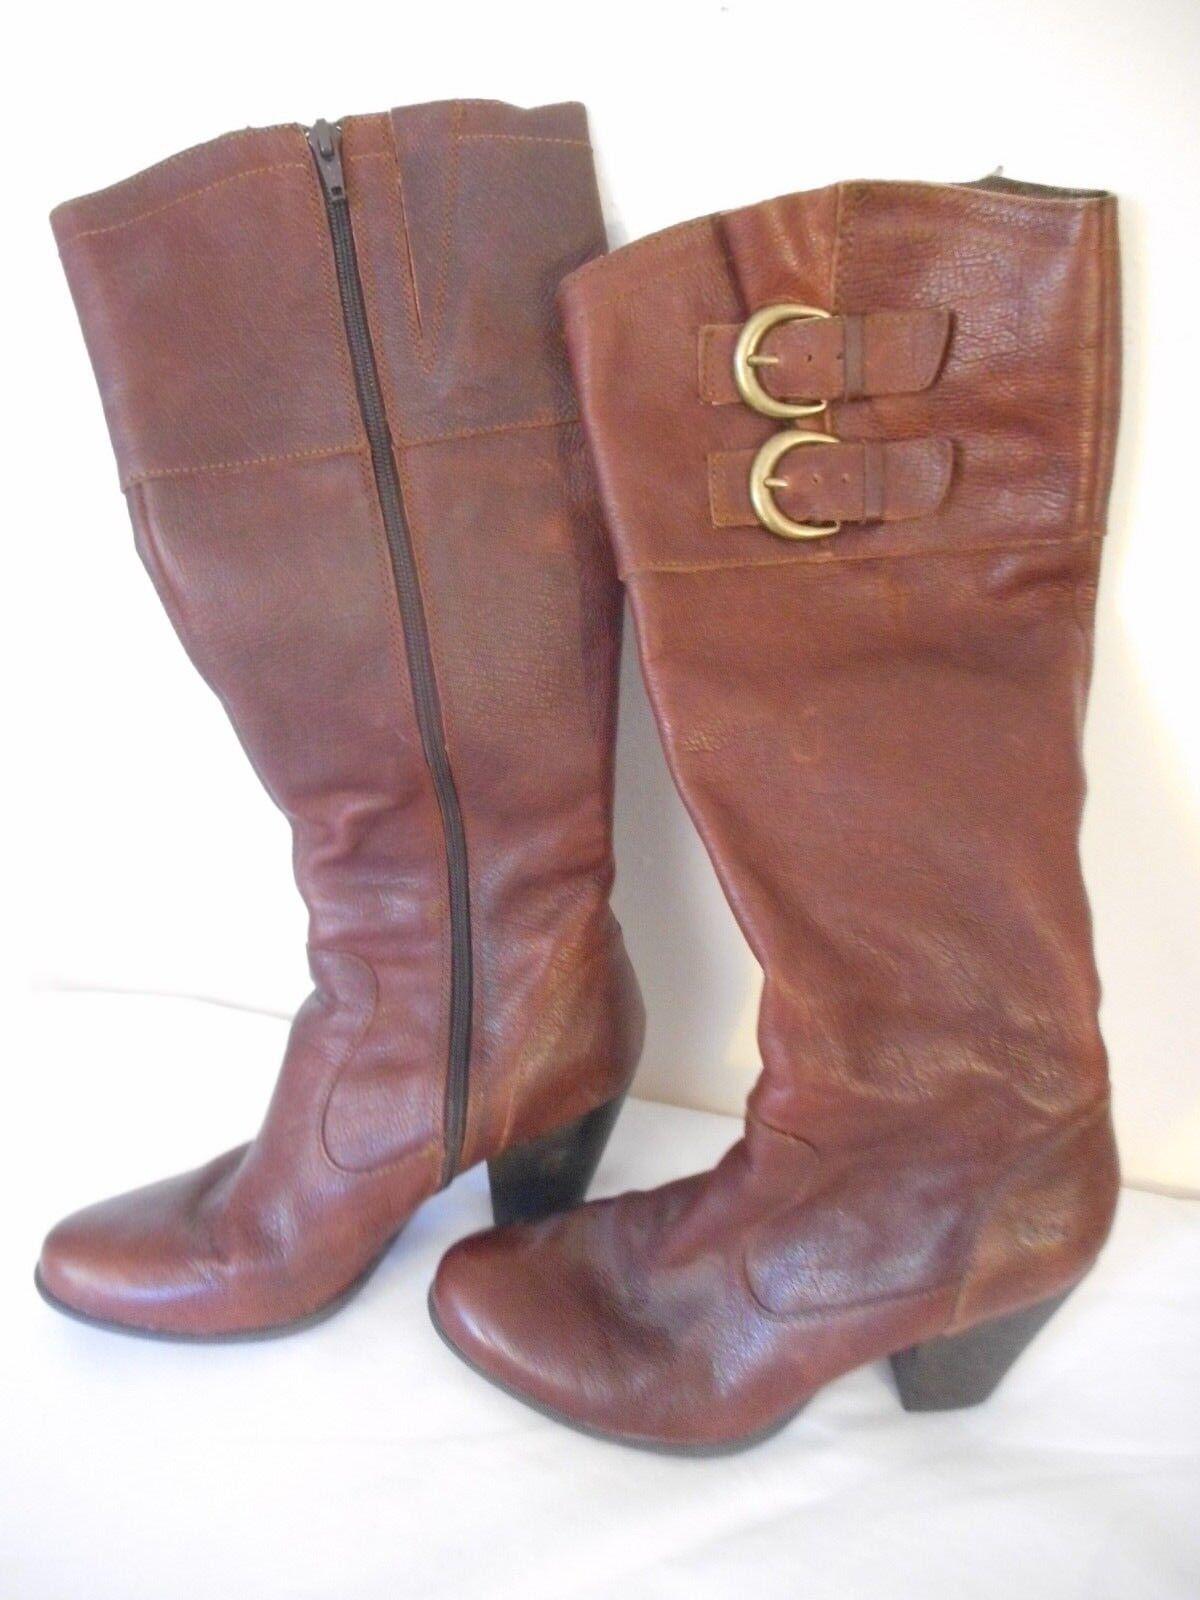 Born of Concept BOC braun Leather 3.25 inch heel Stiefel Größe 6.5  buckle accents